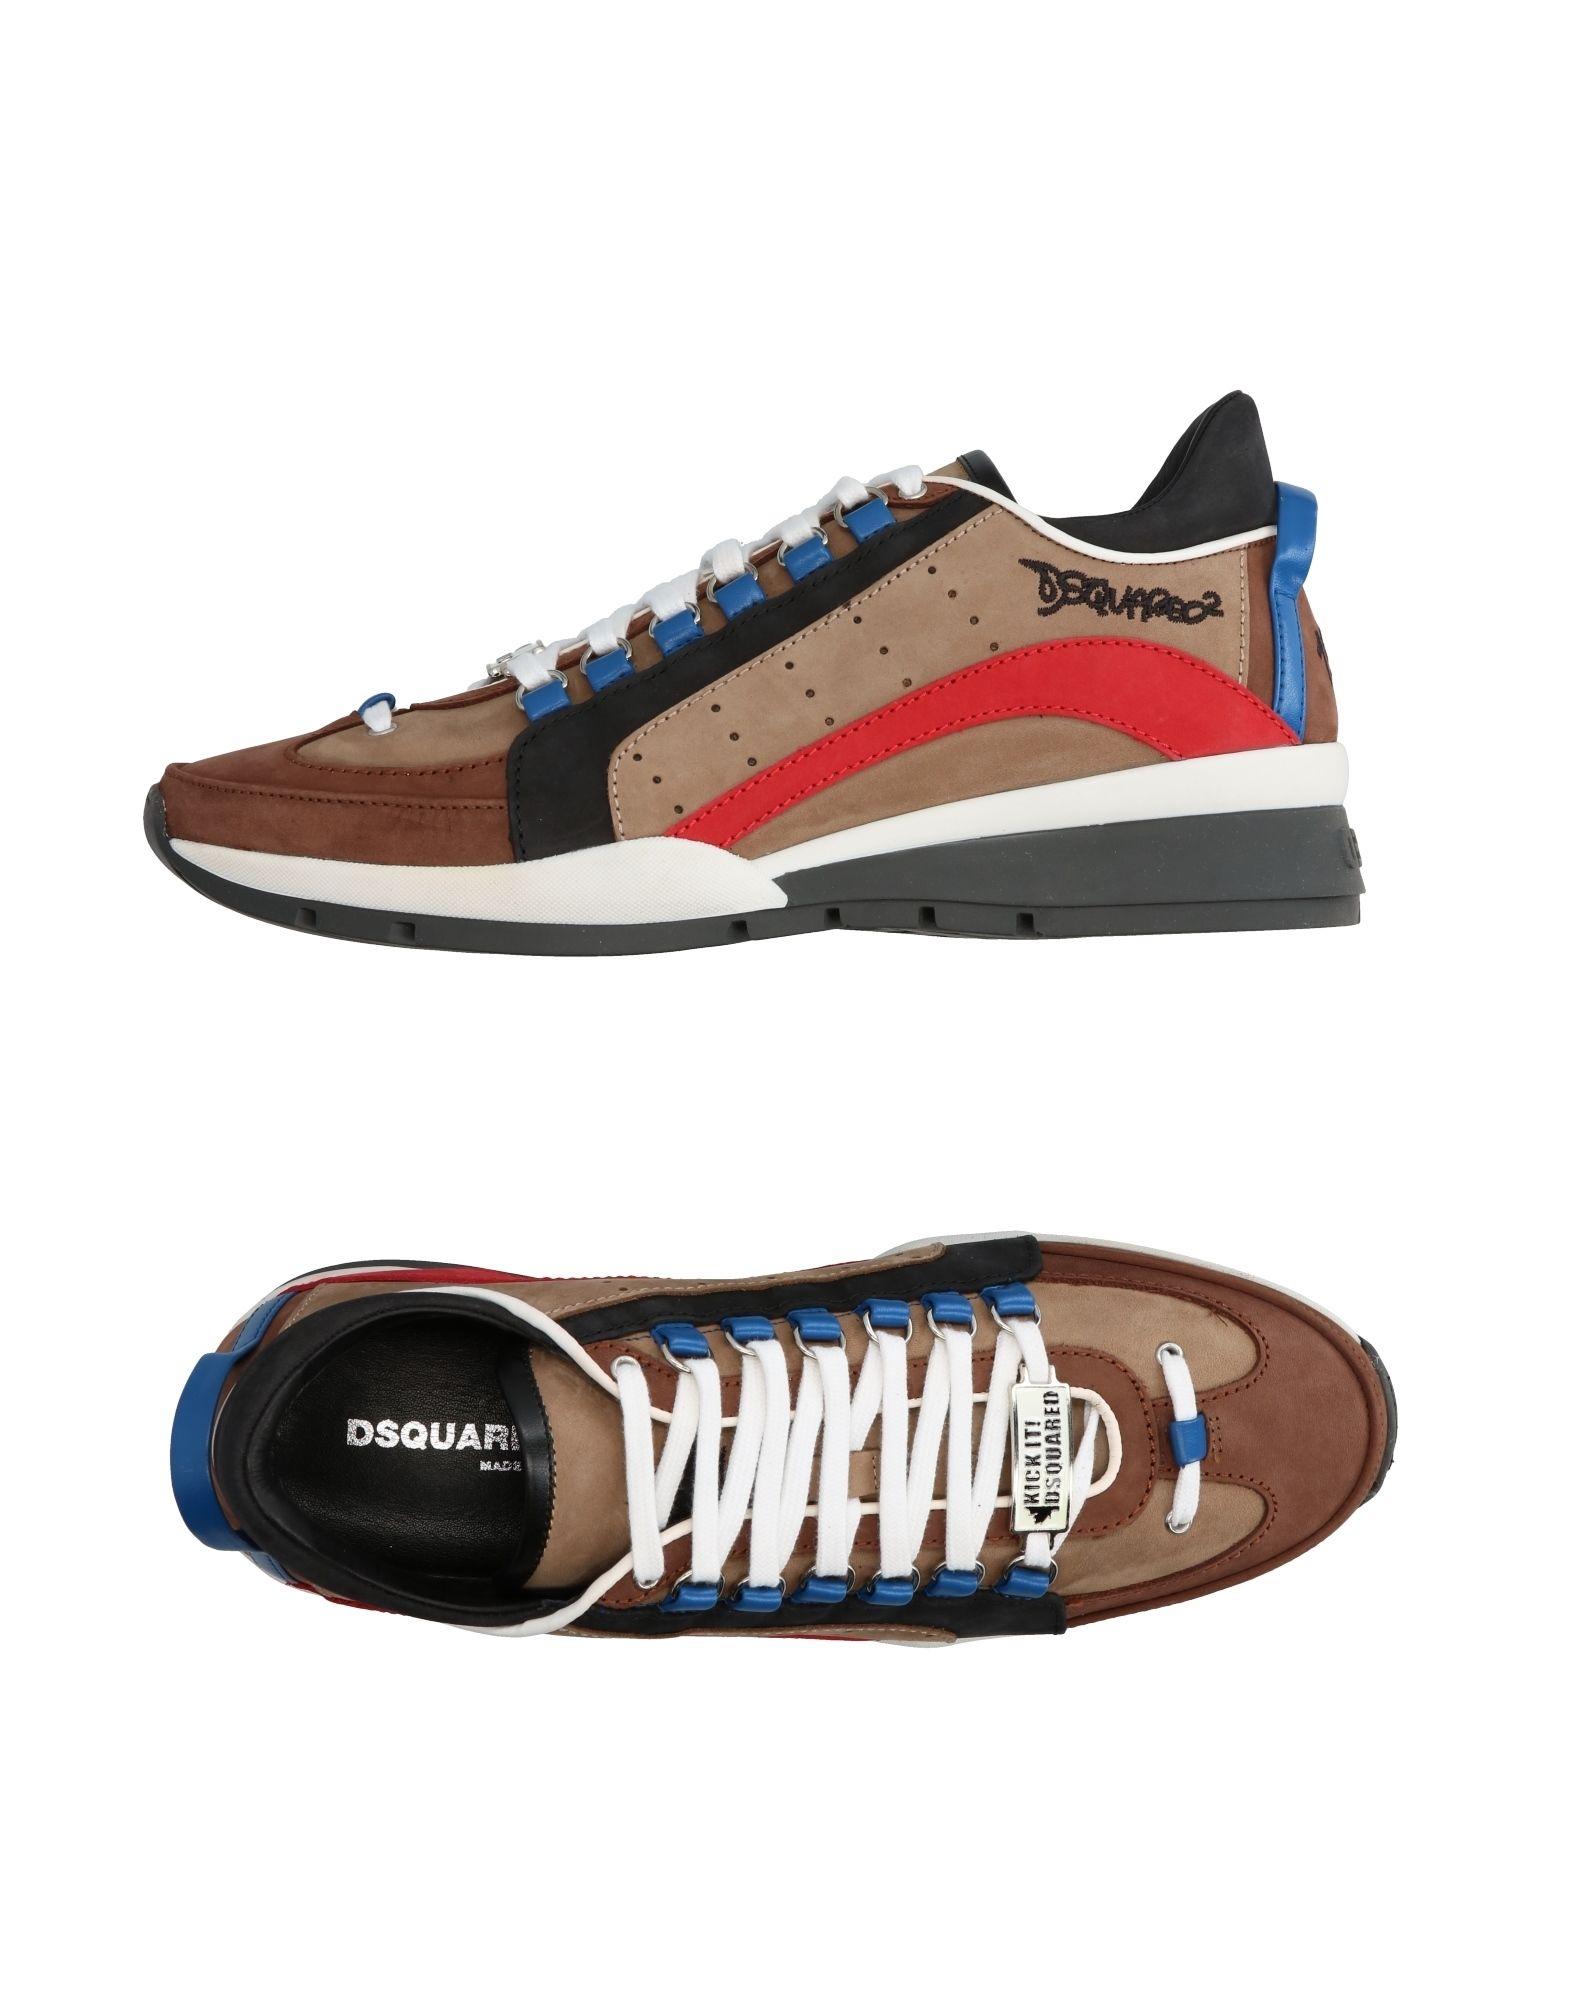 11298778CD Dsquared2 Sneakers Herren  11298778CD  4fc6a3